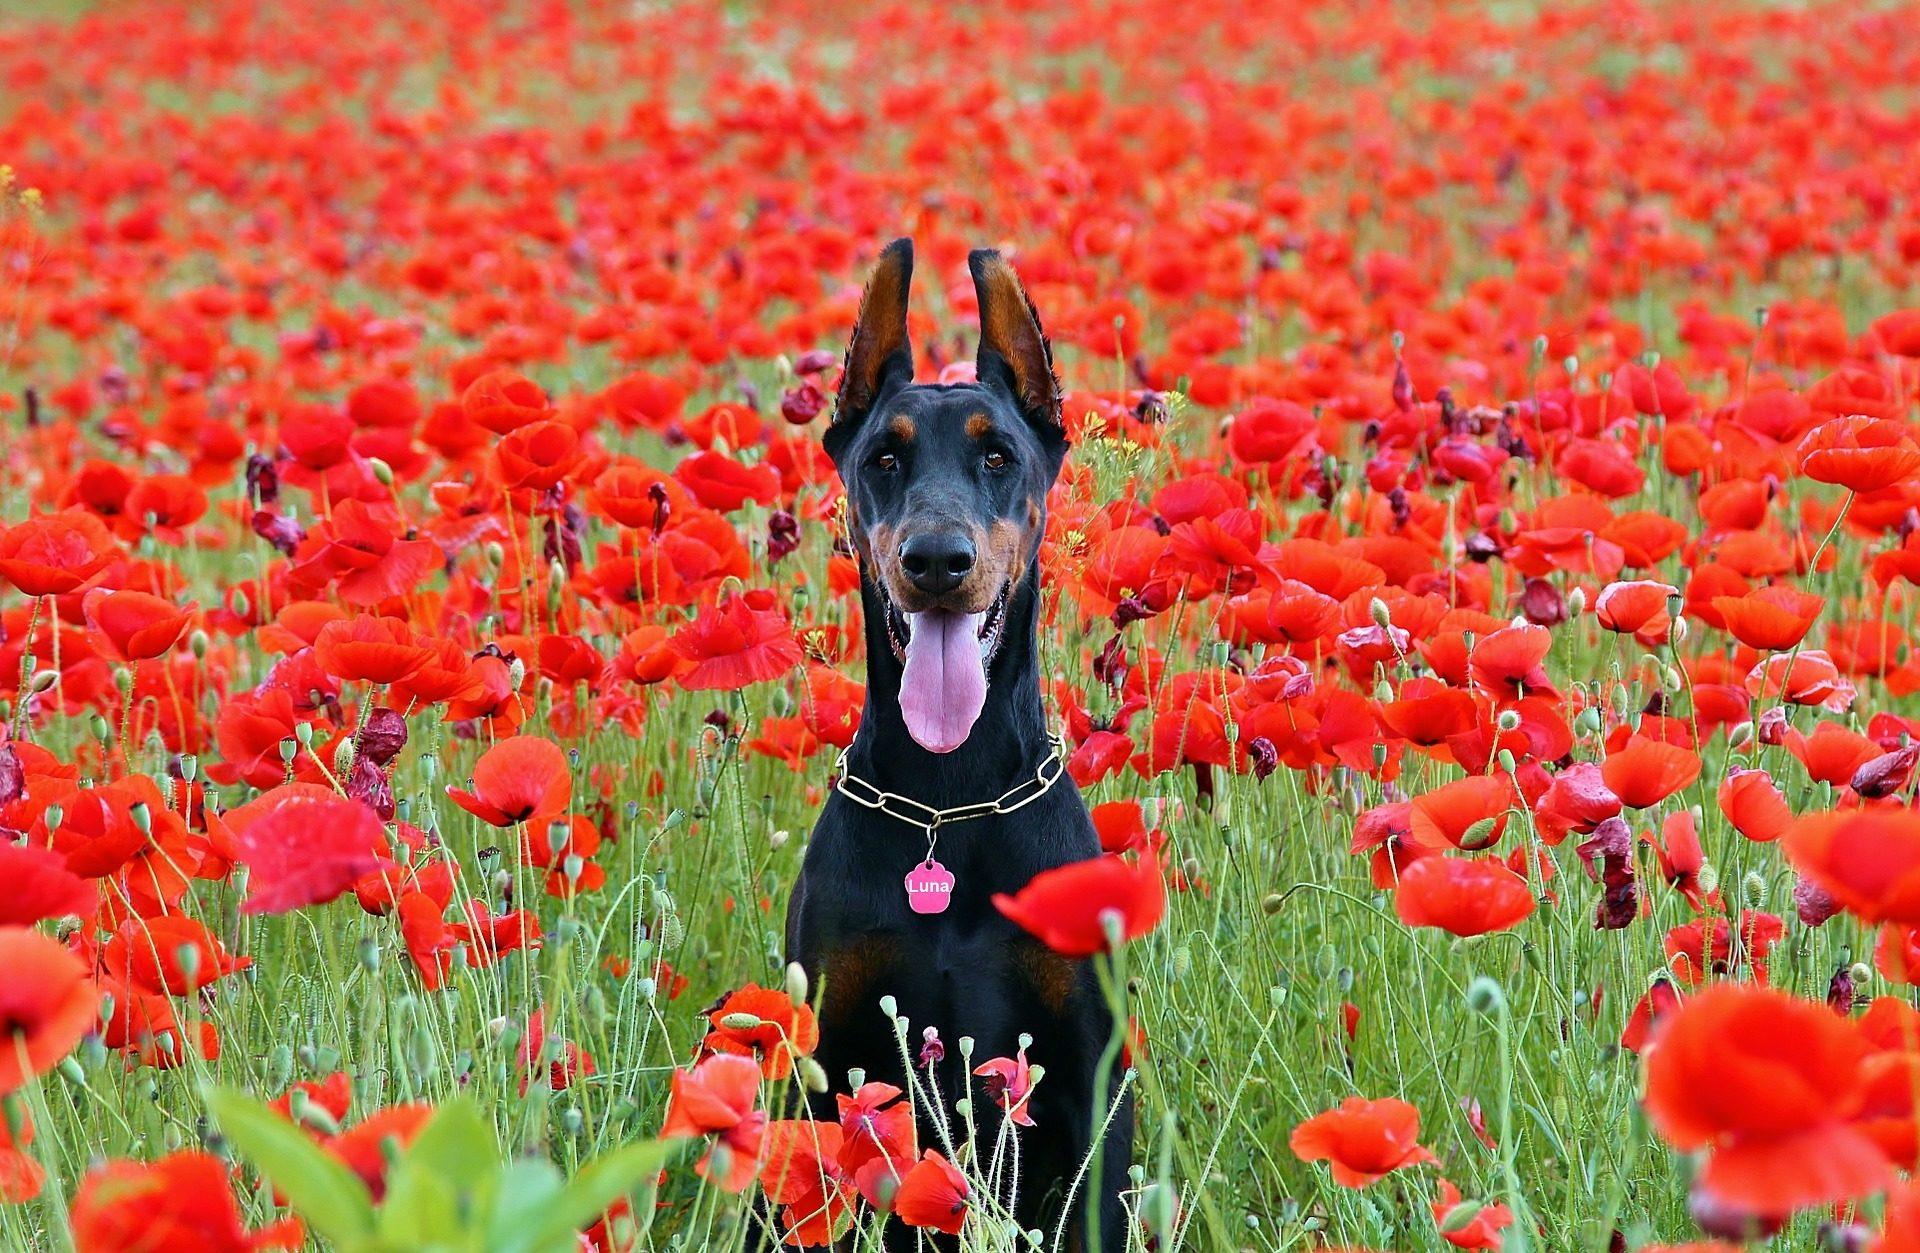 perro, doberman, campo, flores, amapolas - Fondos de Pantalla HD - professor-falken.com